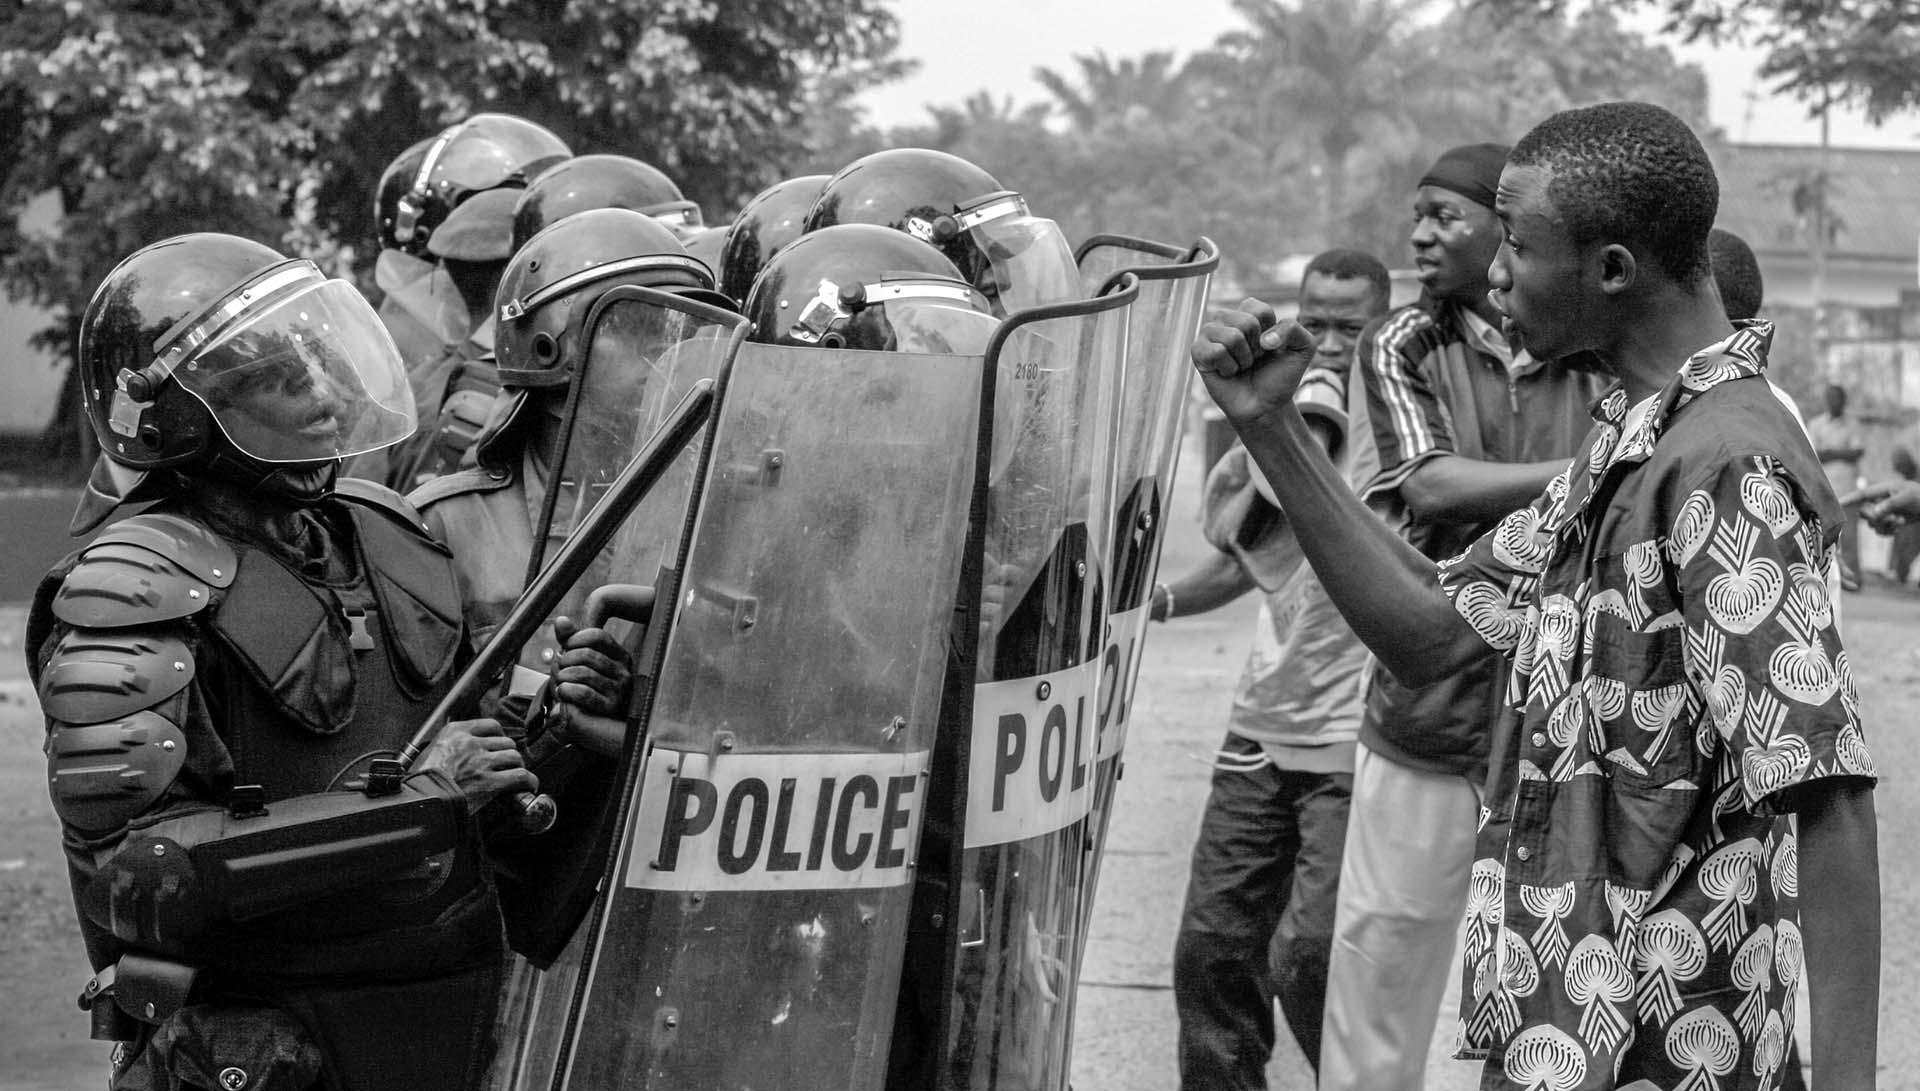 Jiro Ose - Congo independence day